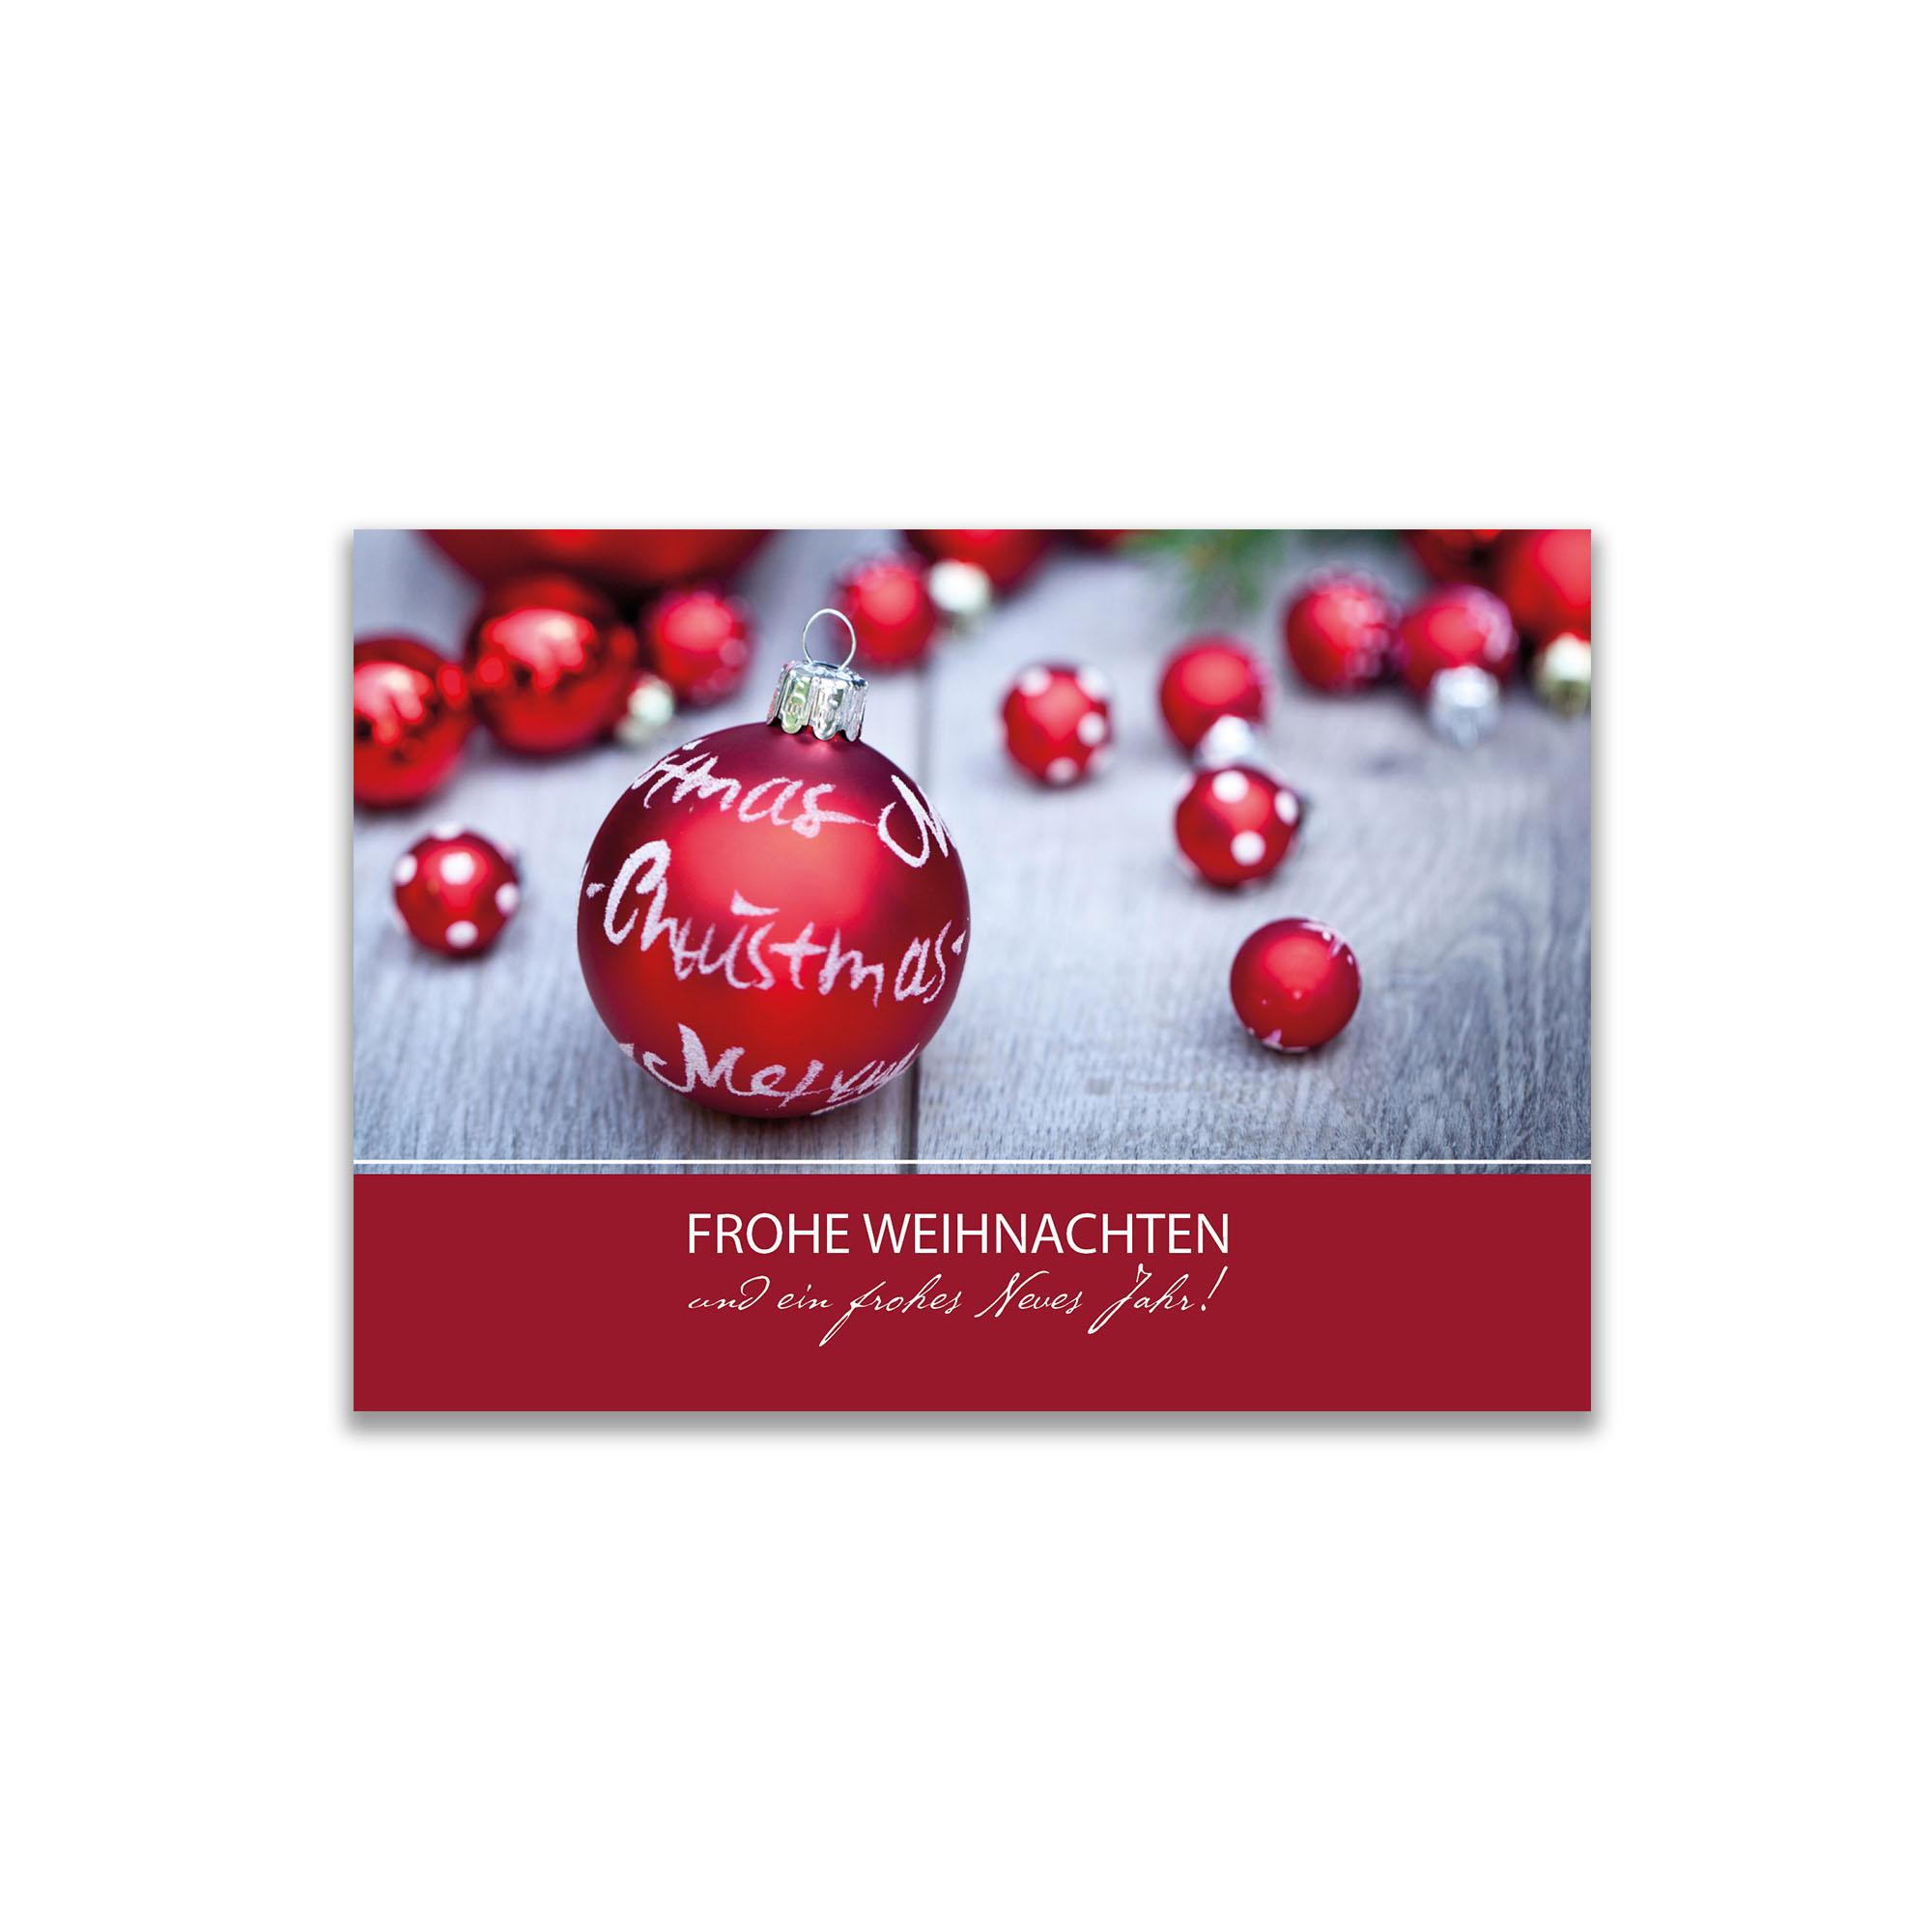 Gru karte frohe weihnachten l peters pralinen peters pralinen - Weihnachtskugel englisch ...